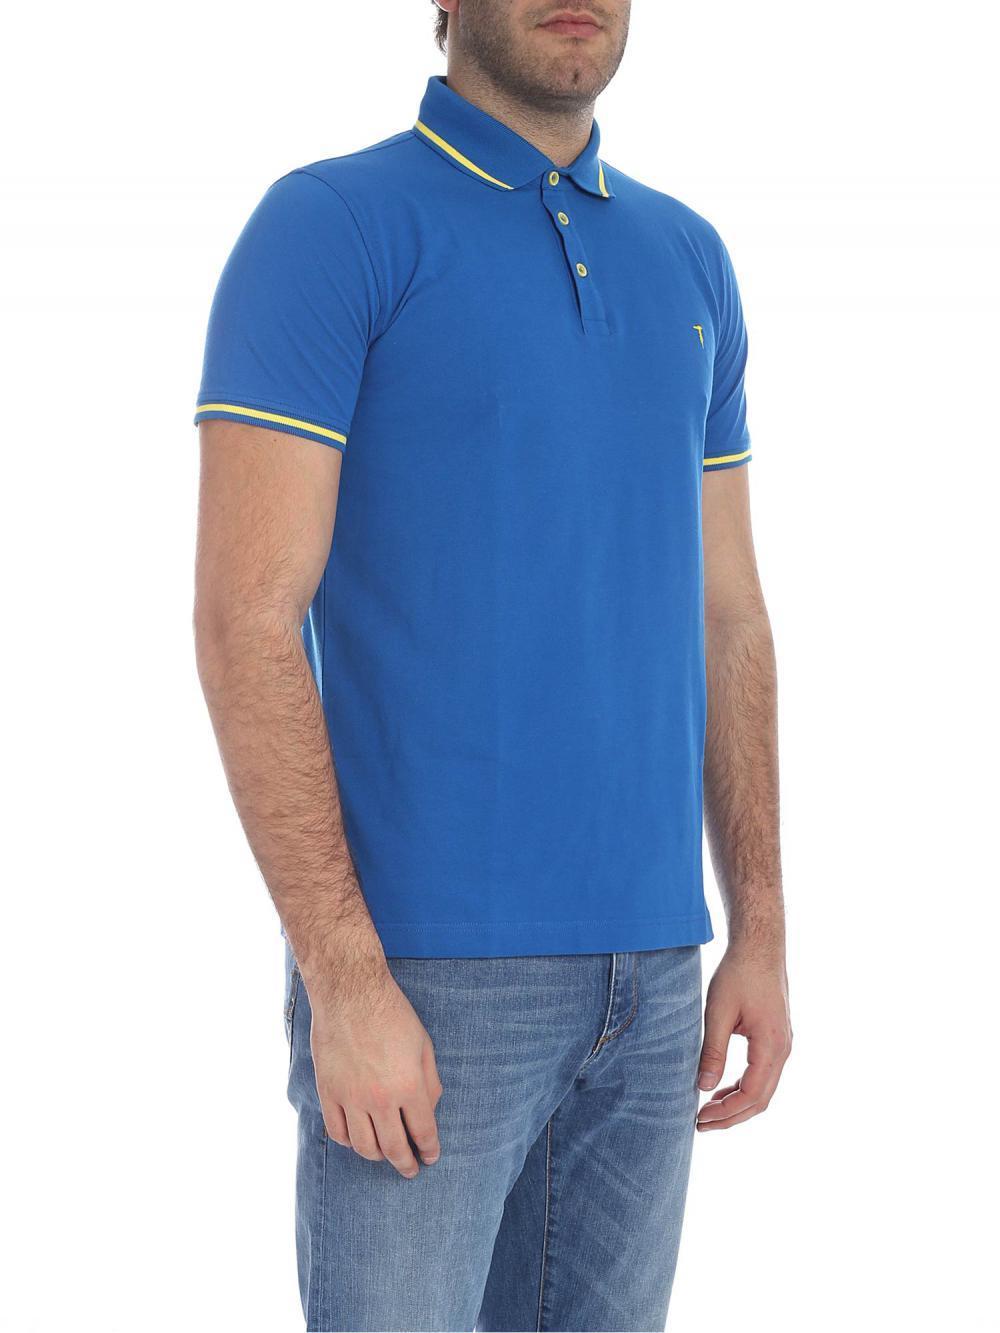 polo-shirt-trussardi-cod-52t00246